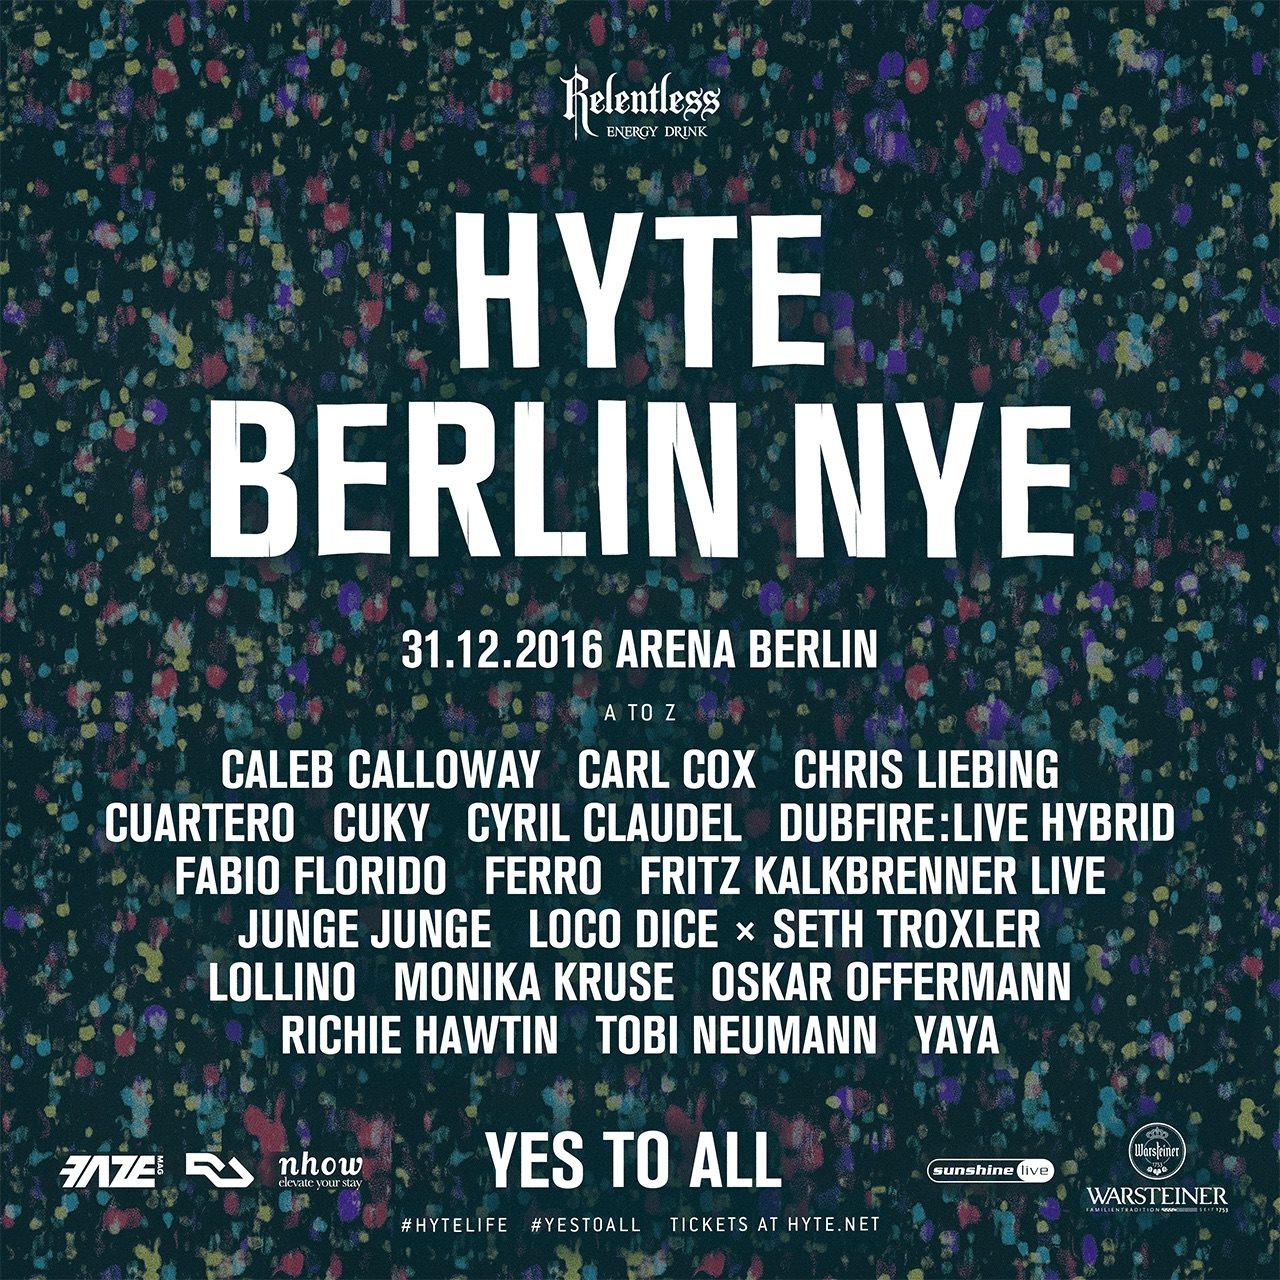 HYTE Berlin NYE 2016 - Flyer front